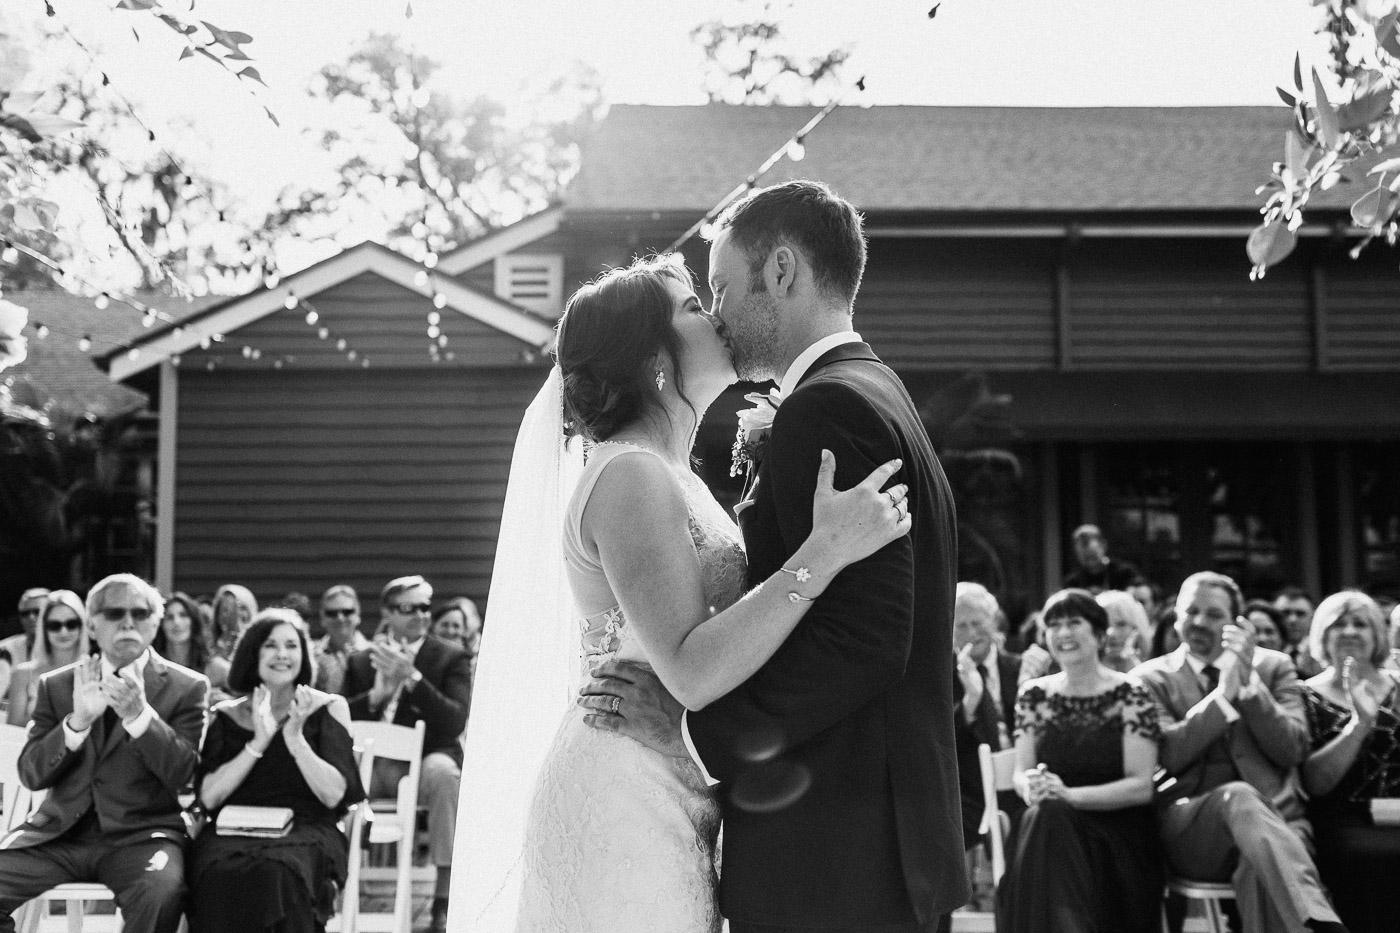 hstoric-dubsdread-wedding-orlando-18.jpg